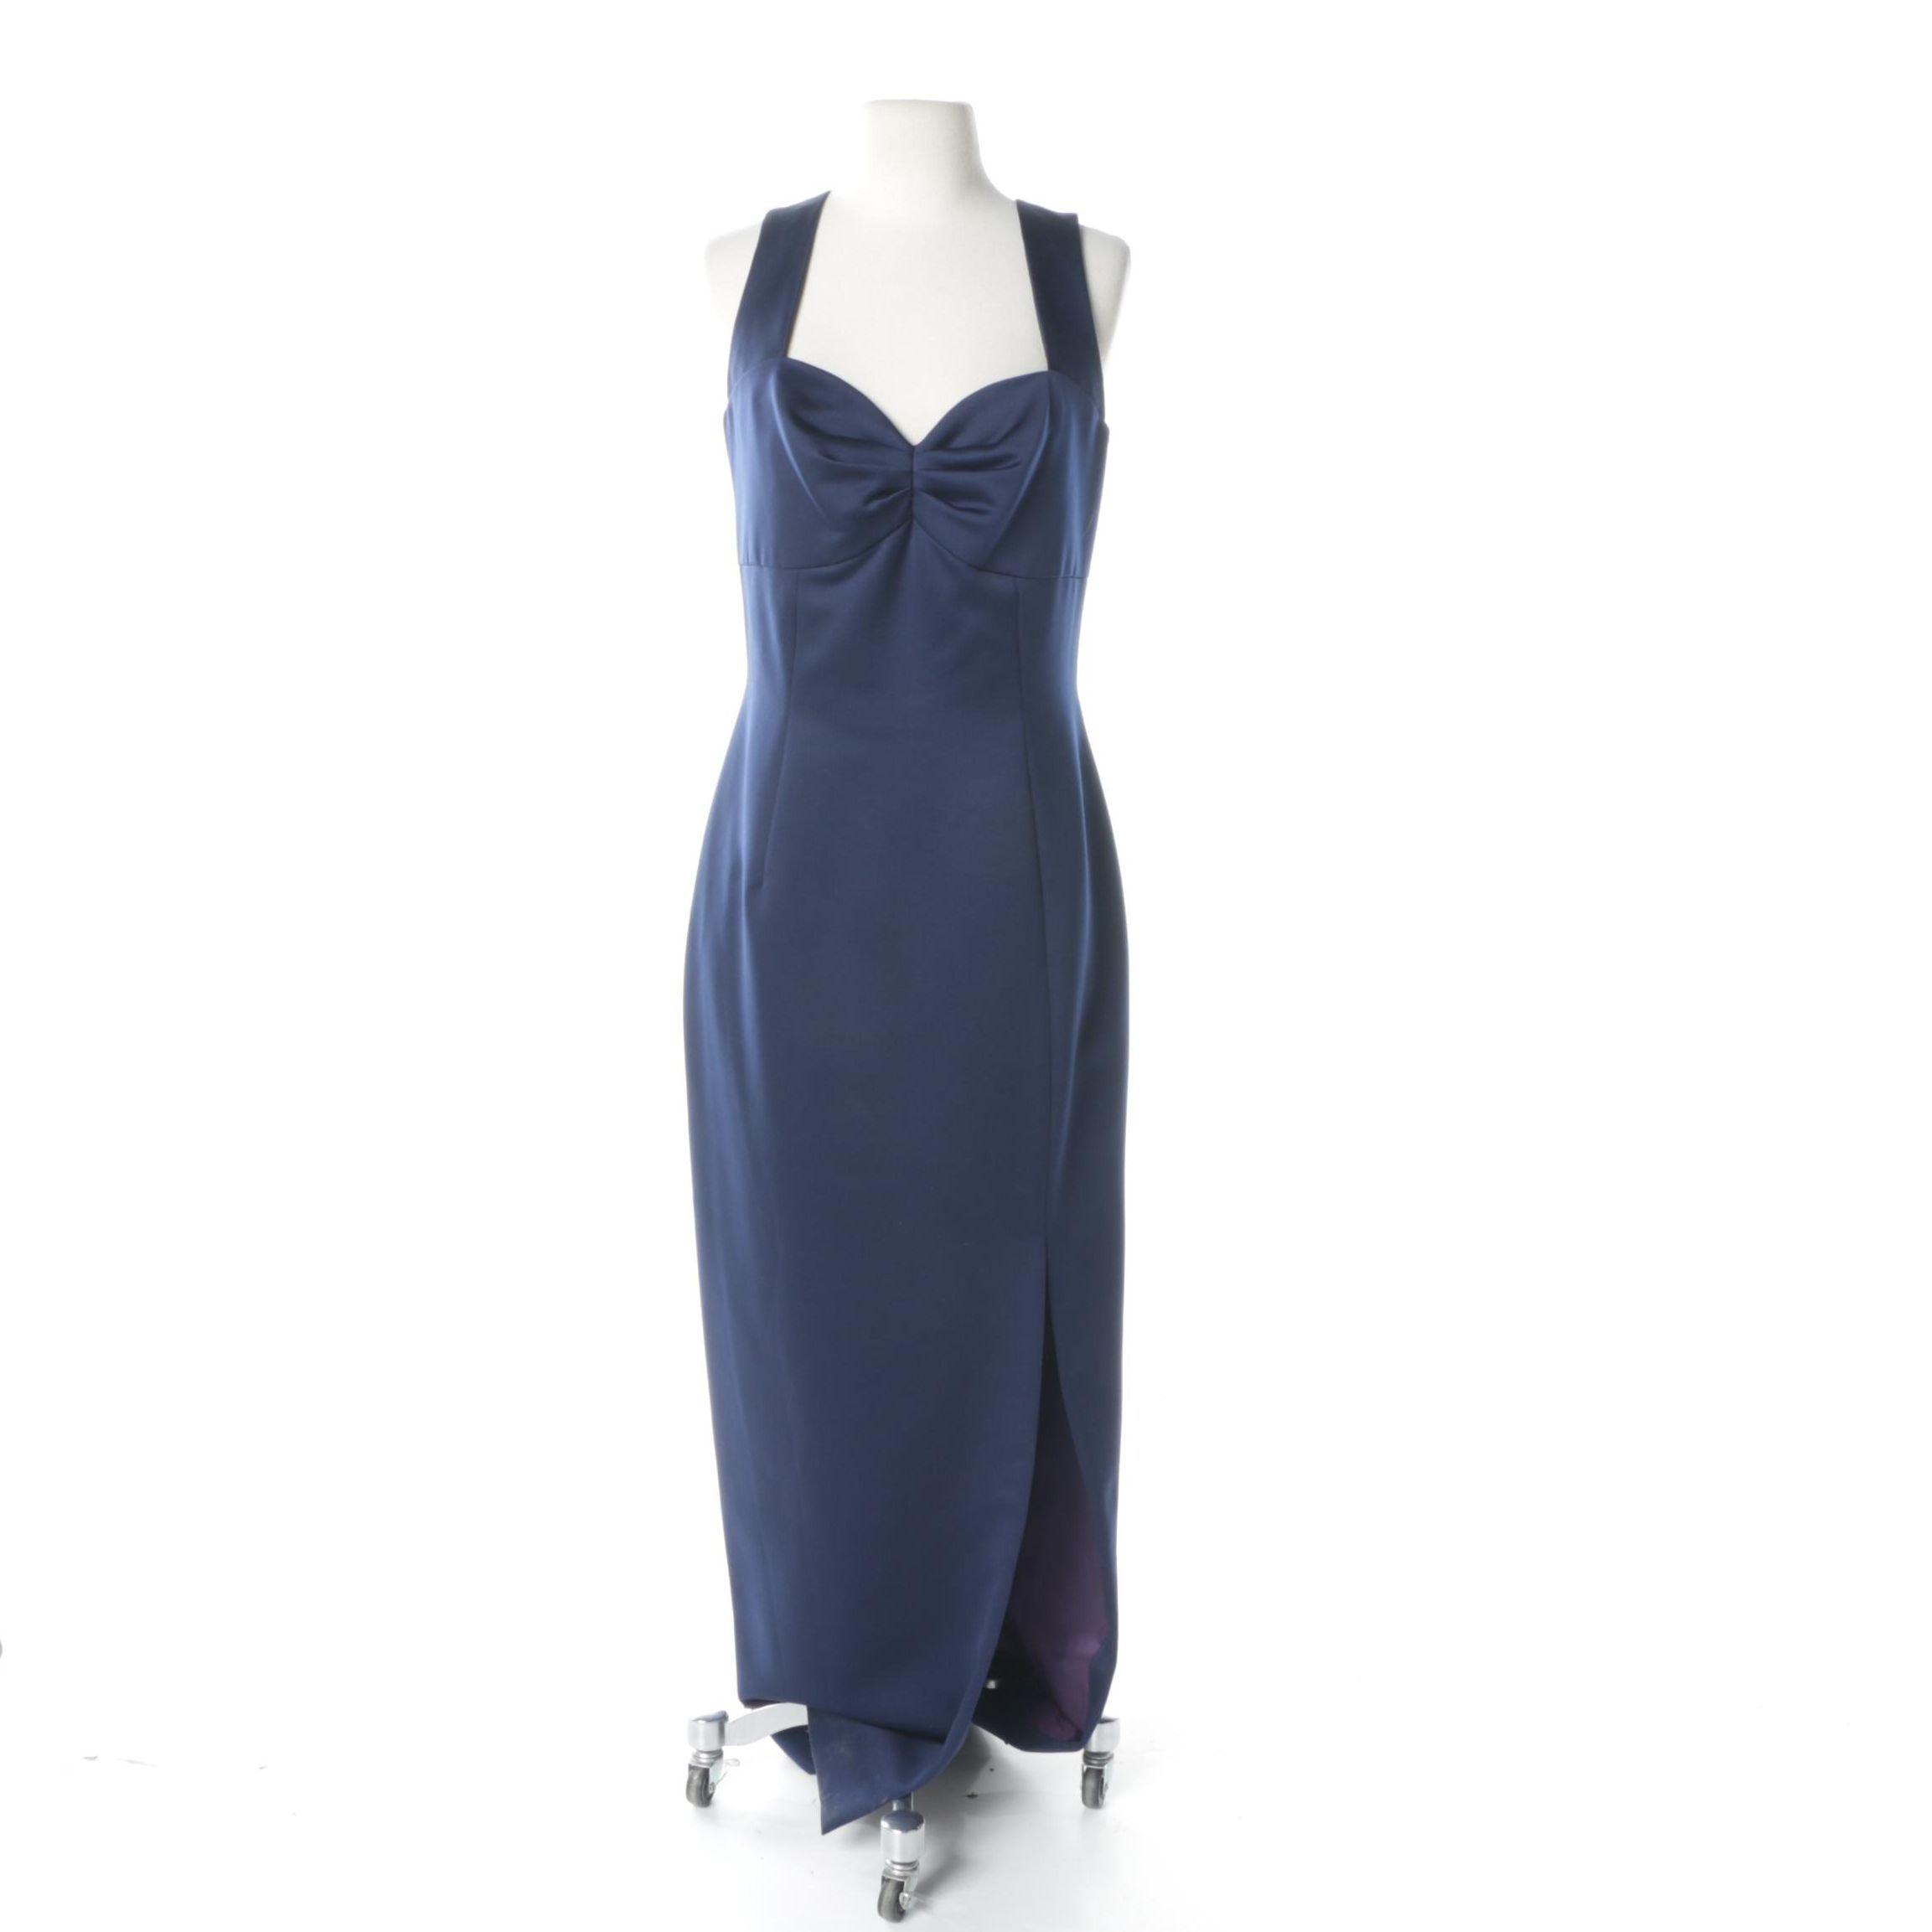 Morton Myles Navy Blue Satin Sleeveless Evening Dress